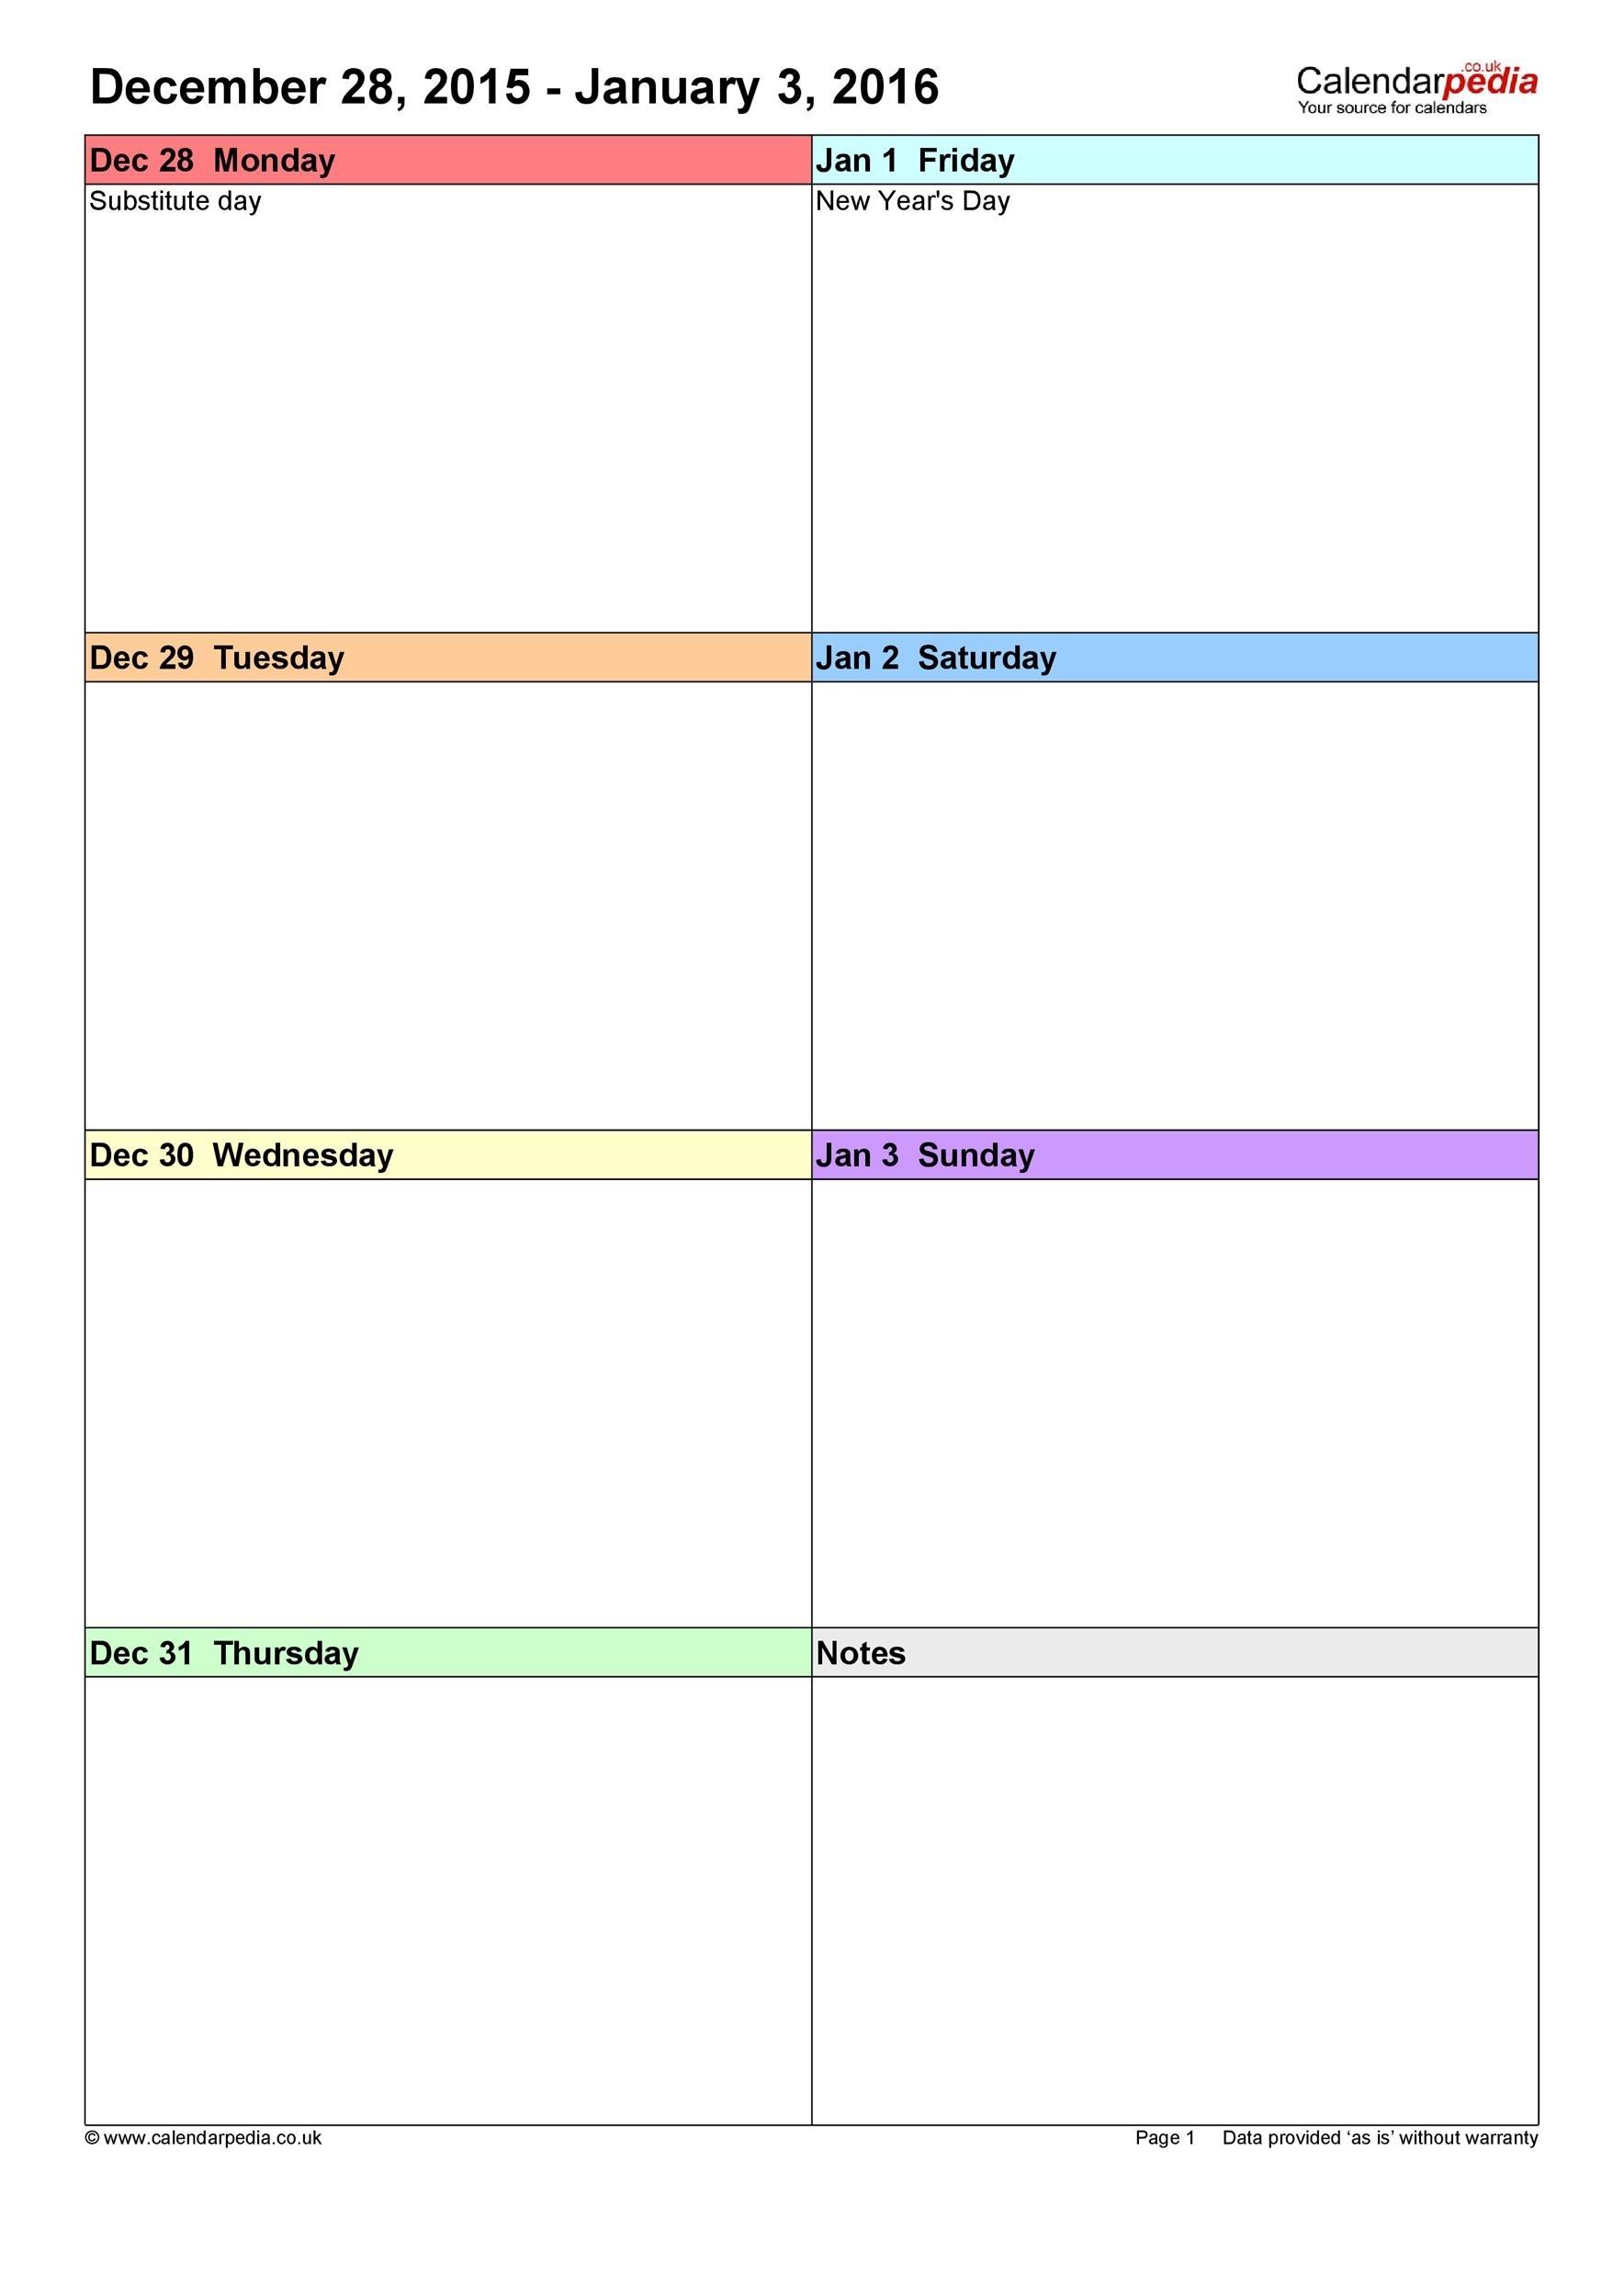 26 Blank Weekly Calendar Templates [Pdf, Excel, Word] ᐅ 1 Week Calendar Template Excel